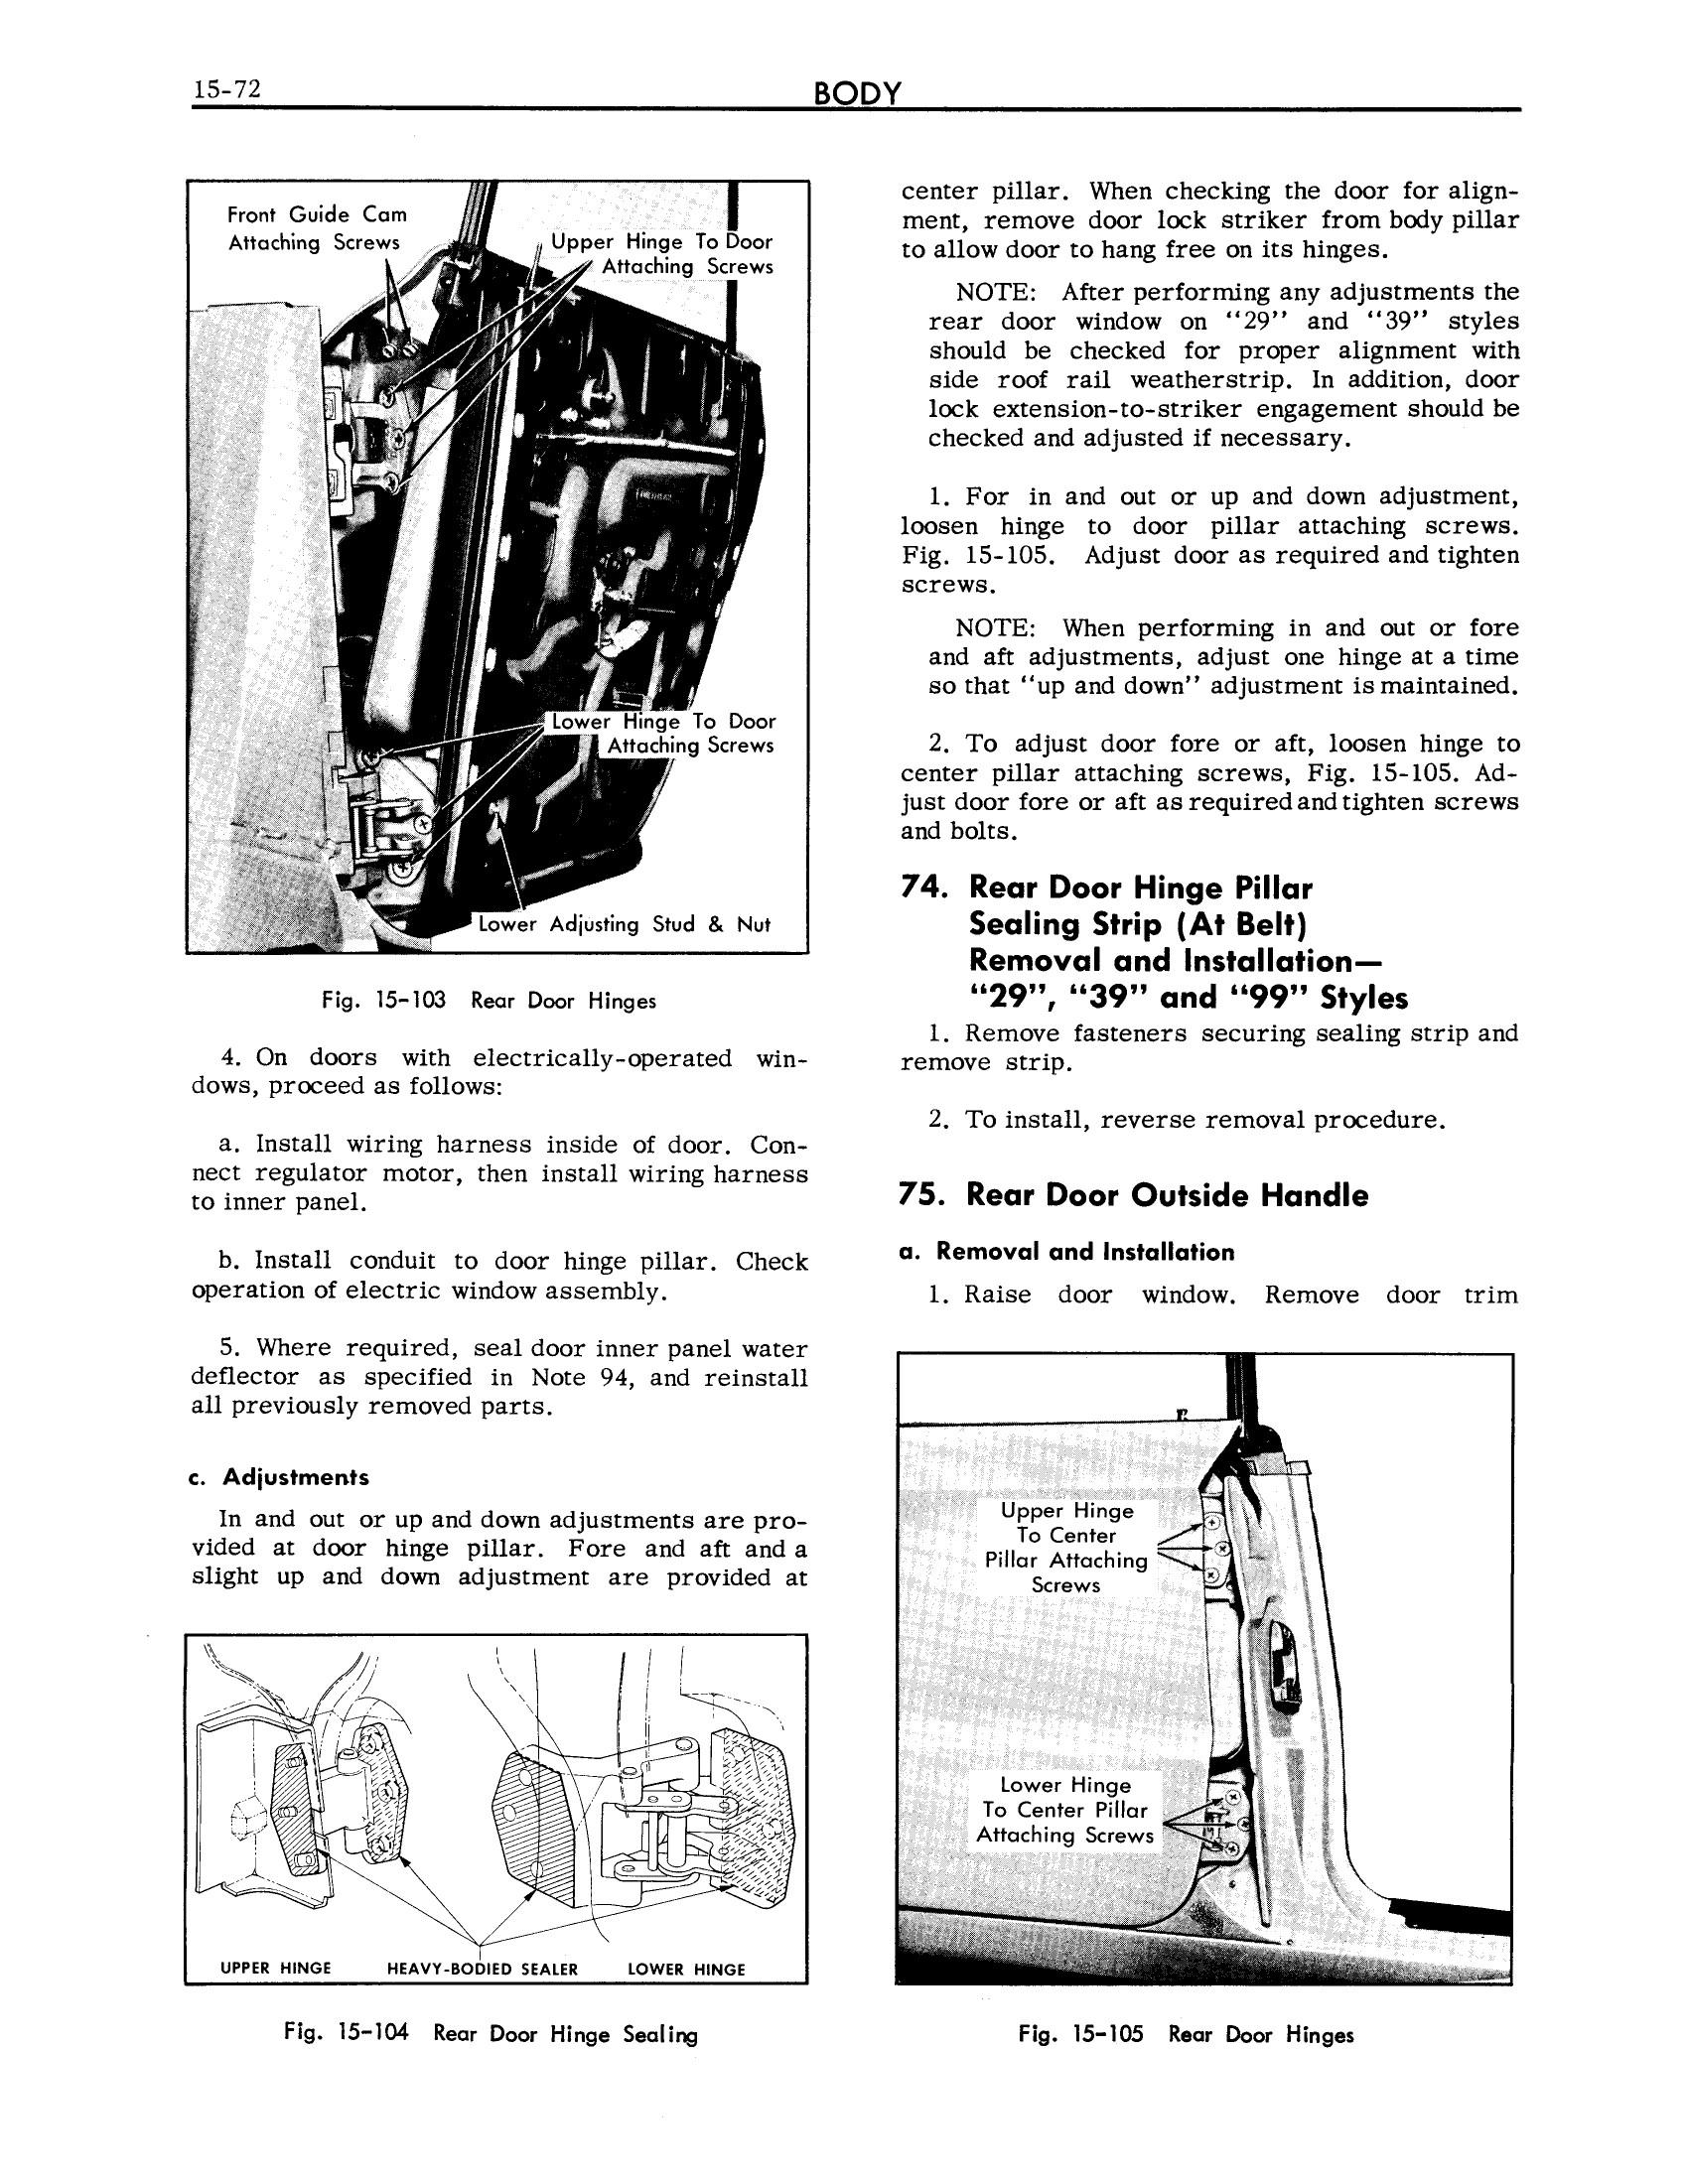 1961 Cadillac Shop Manual- Body Page 72 of 114